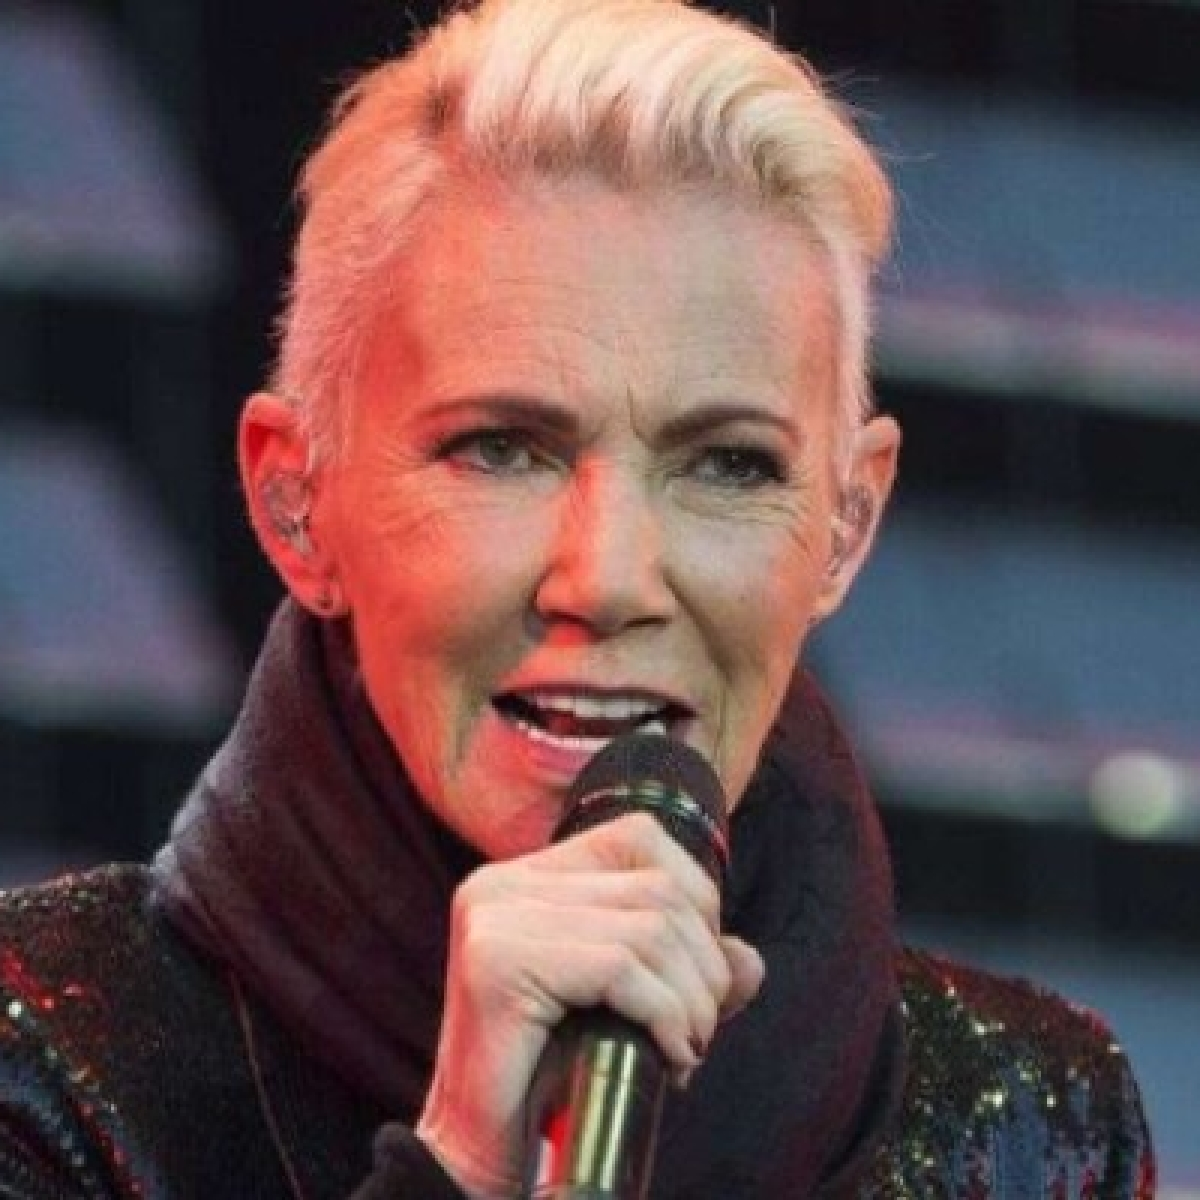 'Roxette' Singer Marie Fredriksson passes away battling cancer at 61